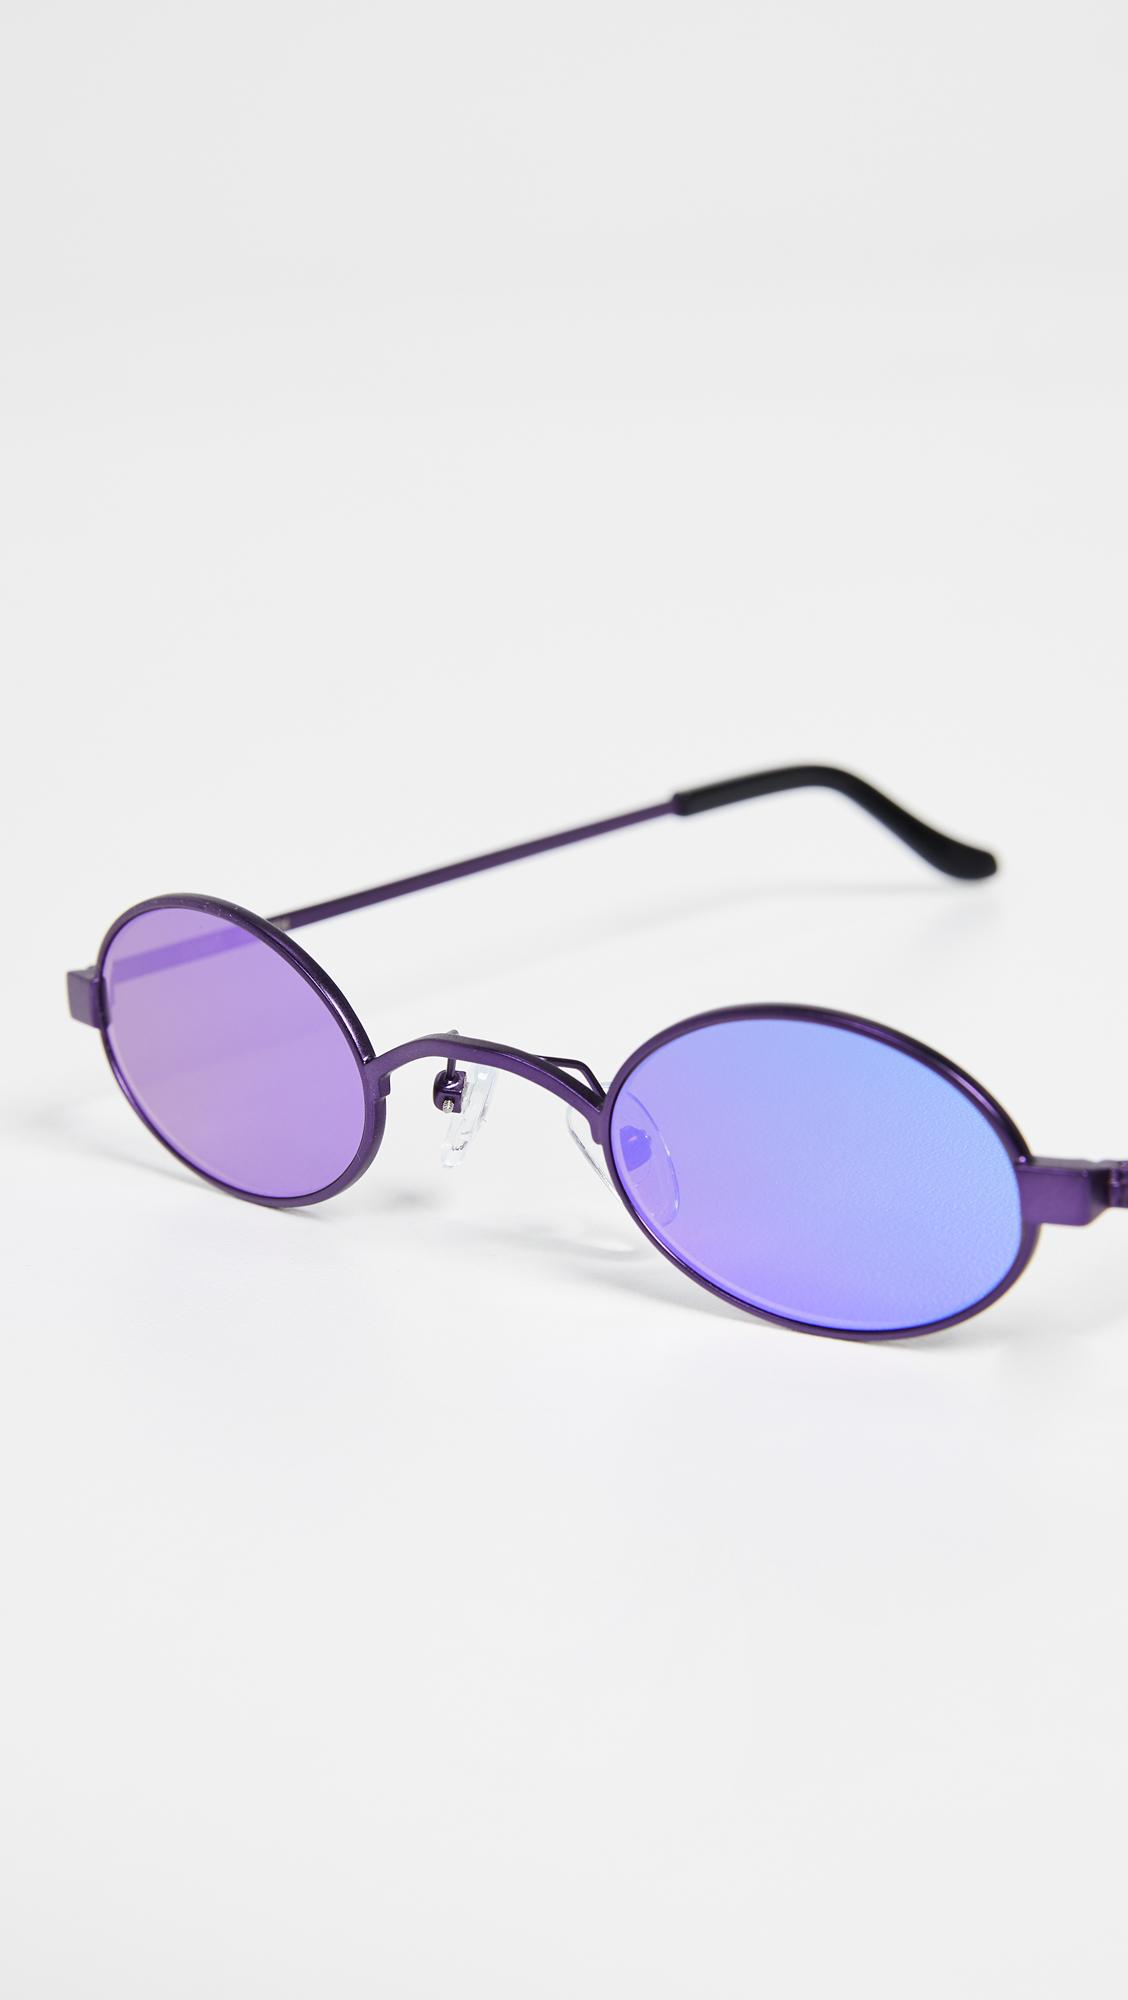 80ca9fbaeace7 Roberi   Fraud Doris Sunglasses